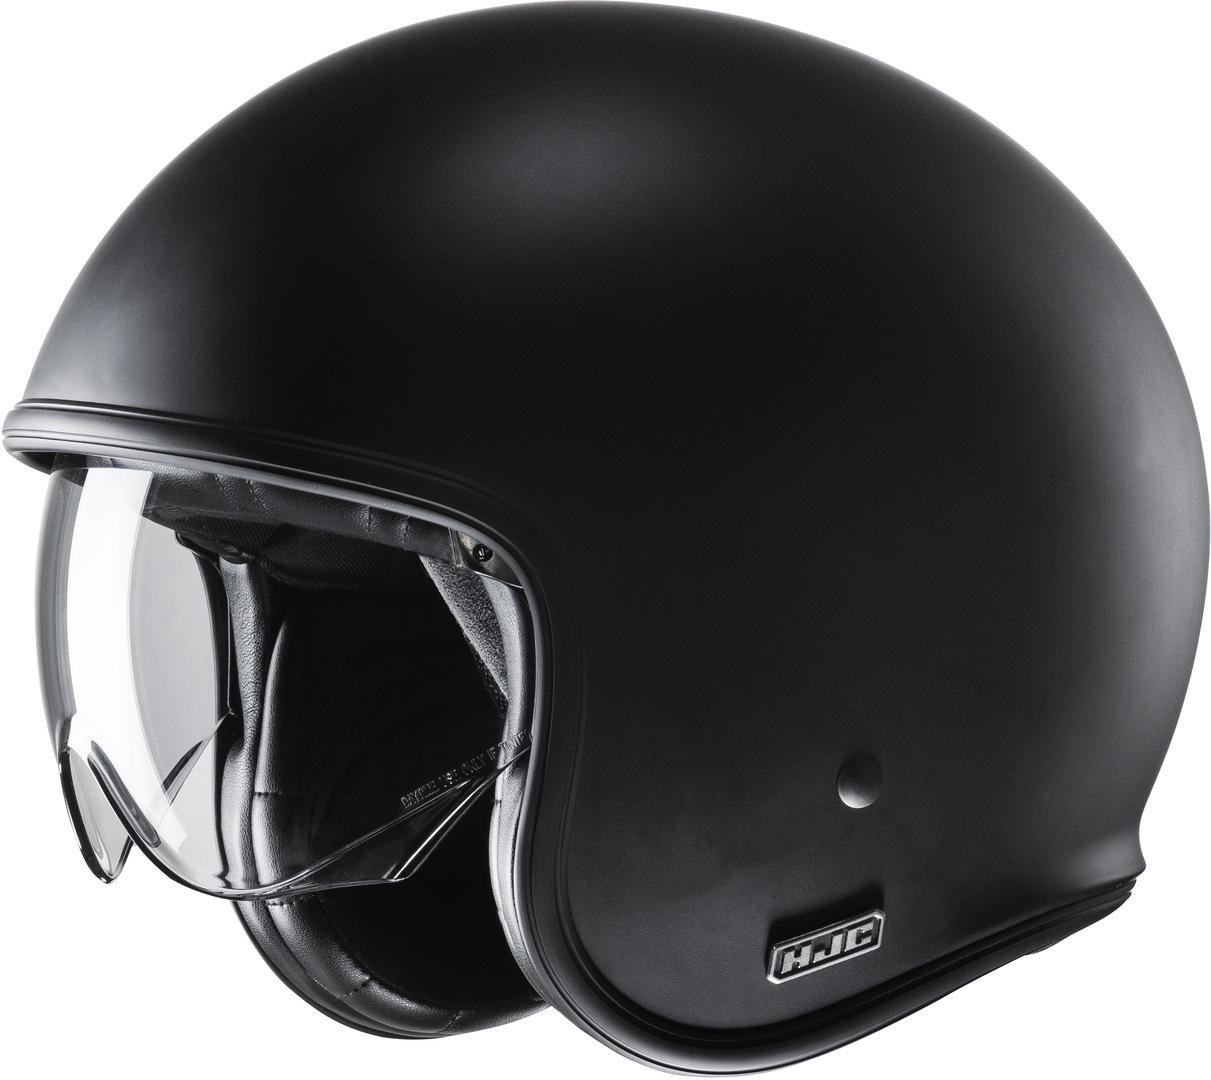 HJC V30 Jethelm, schwarz, Größe 2XL, schwarz, Größe 2XL